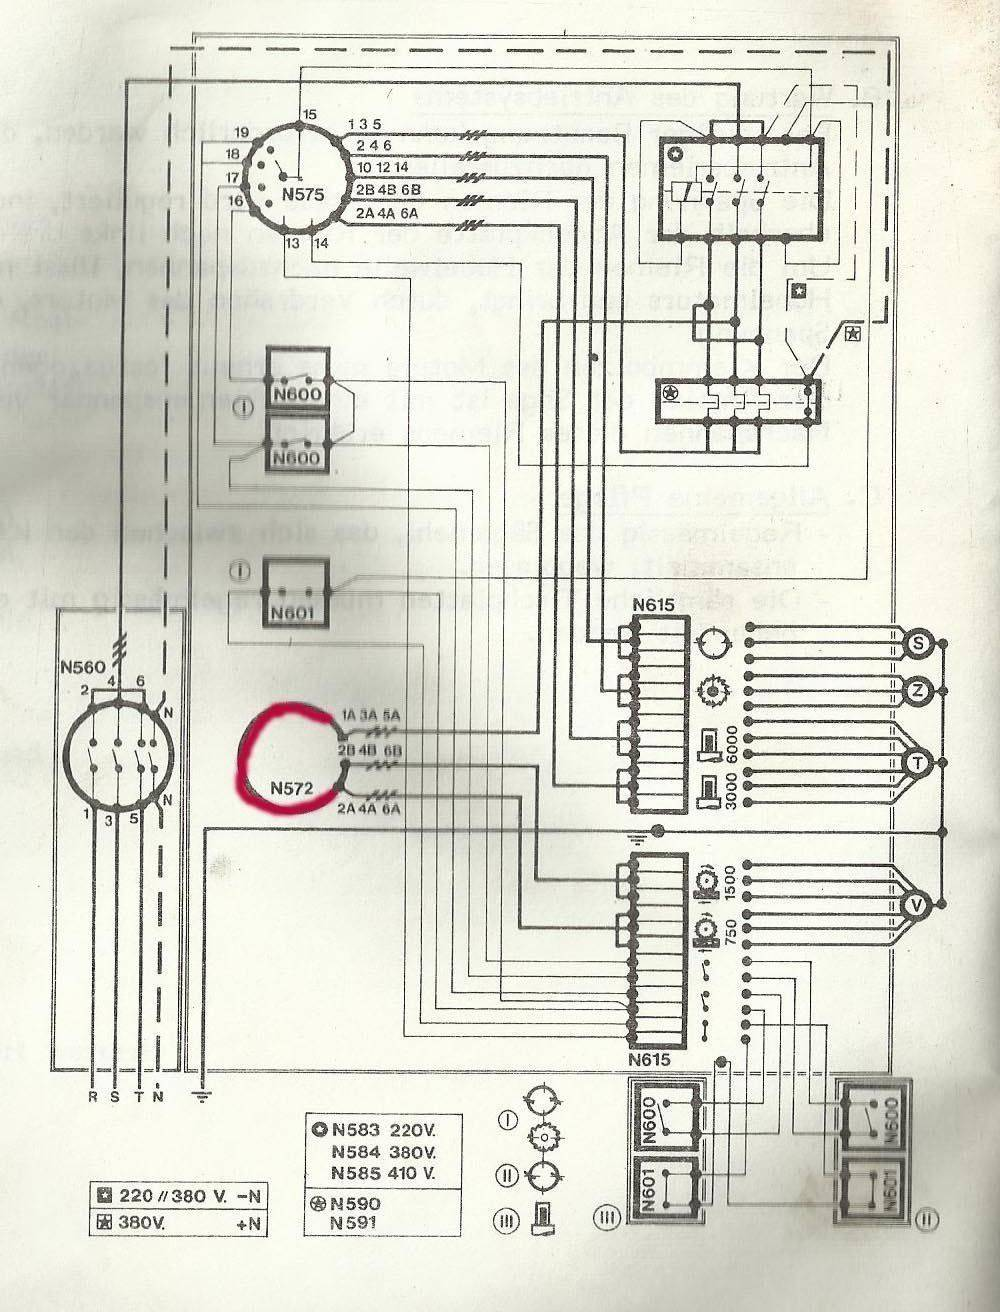 Schema elec 02 - Robland K310.jpg